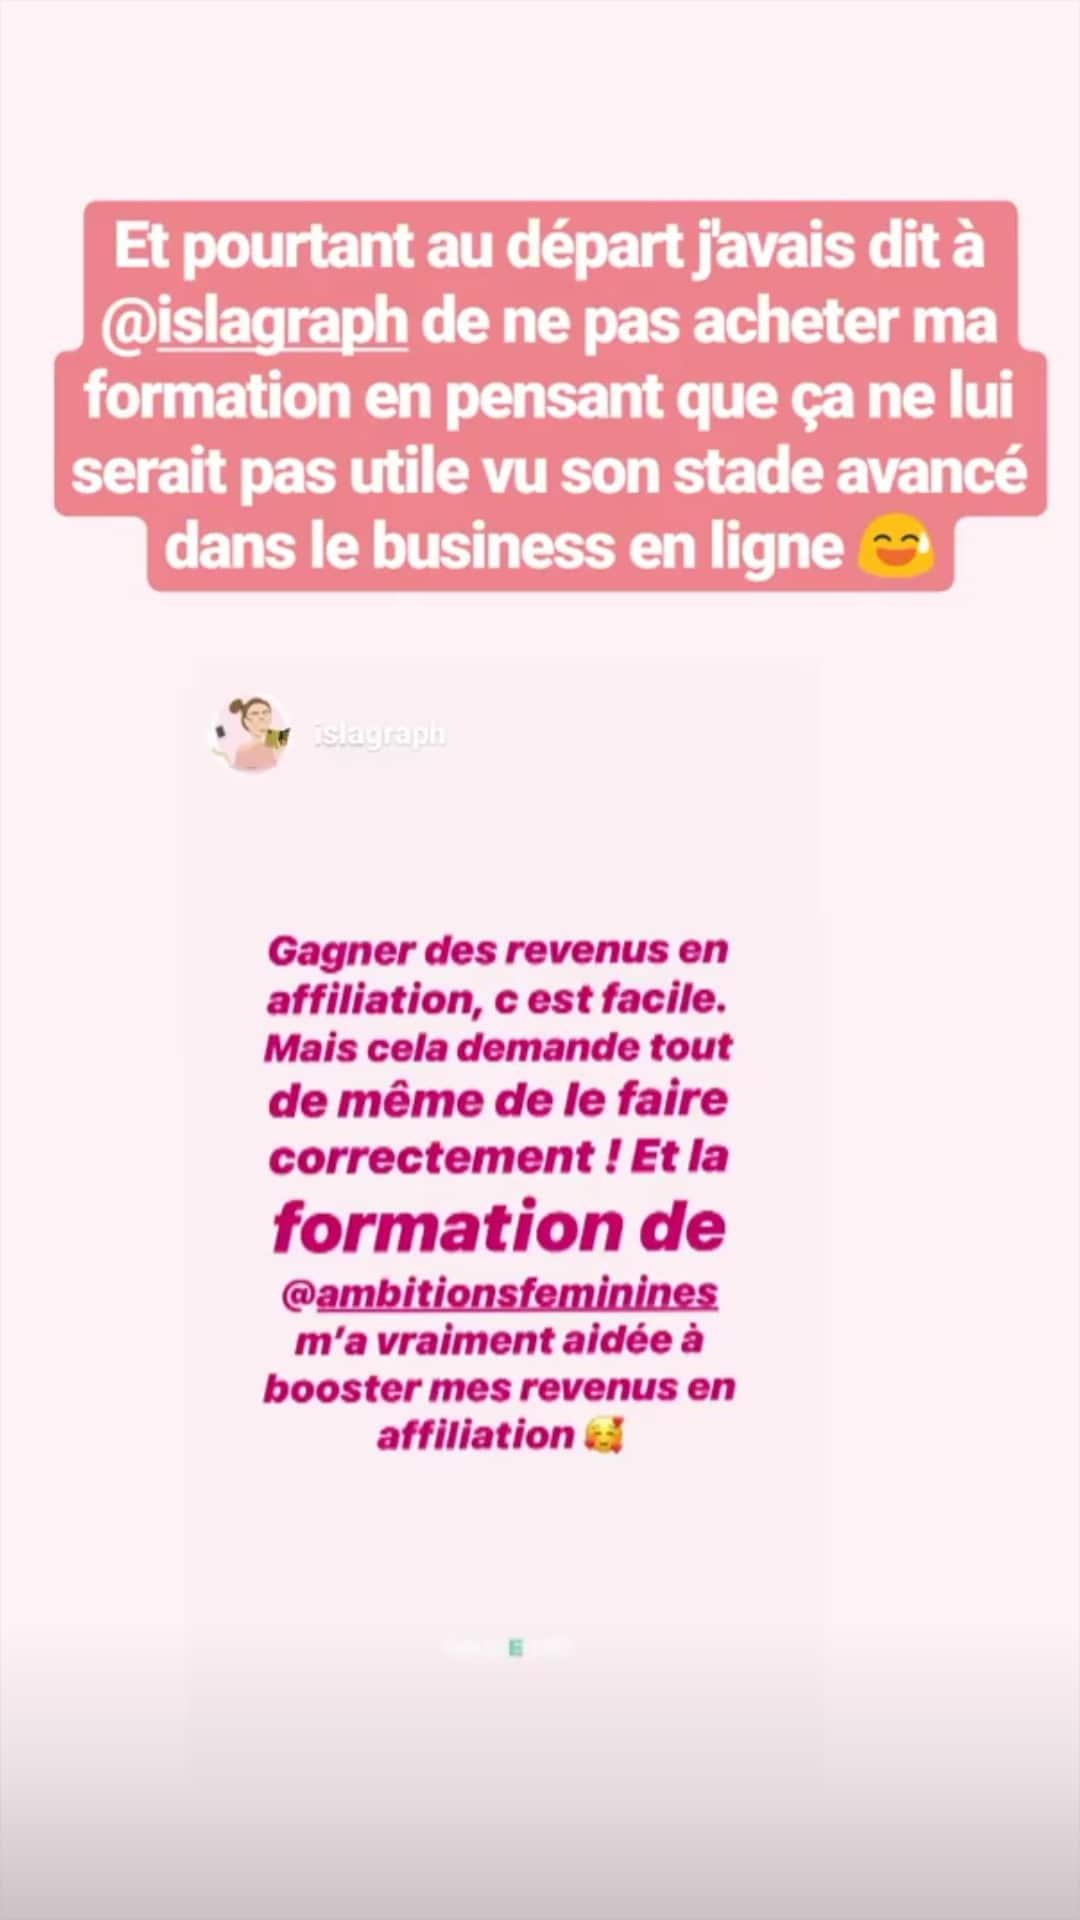 Avis-Les-Reines-Affiliation_20200605_085048